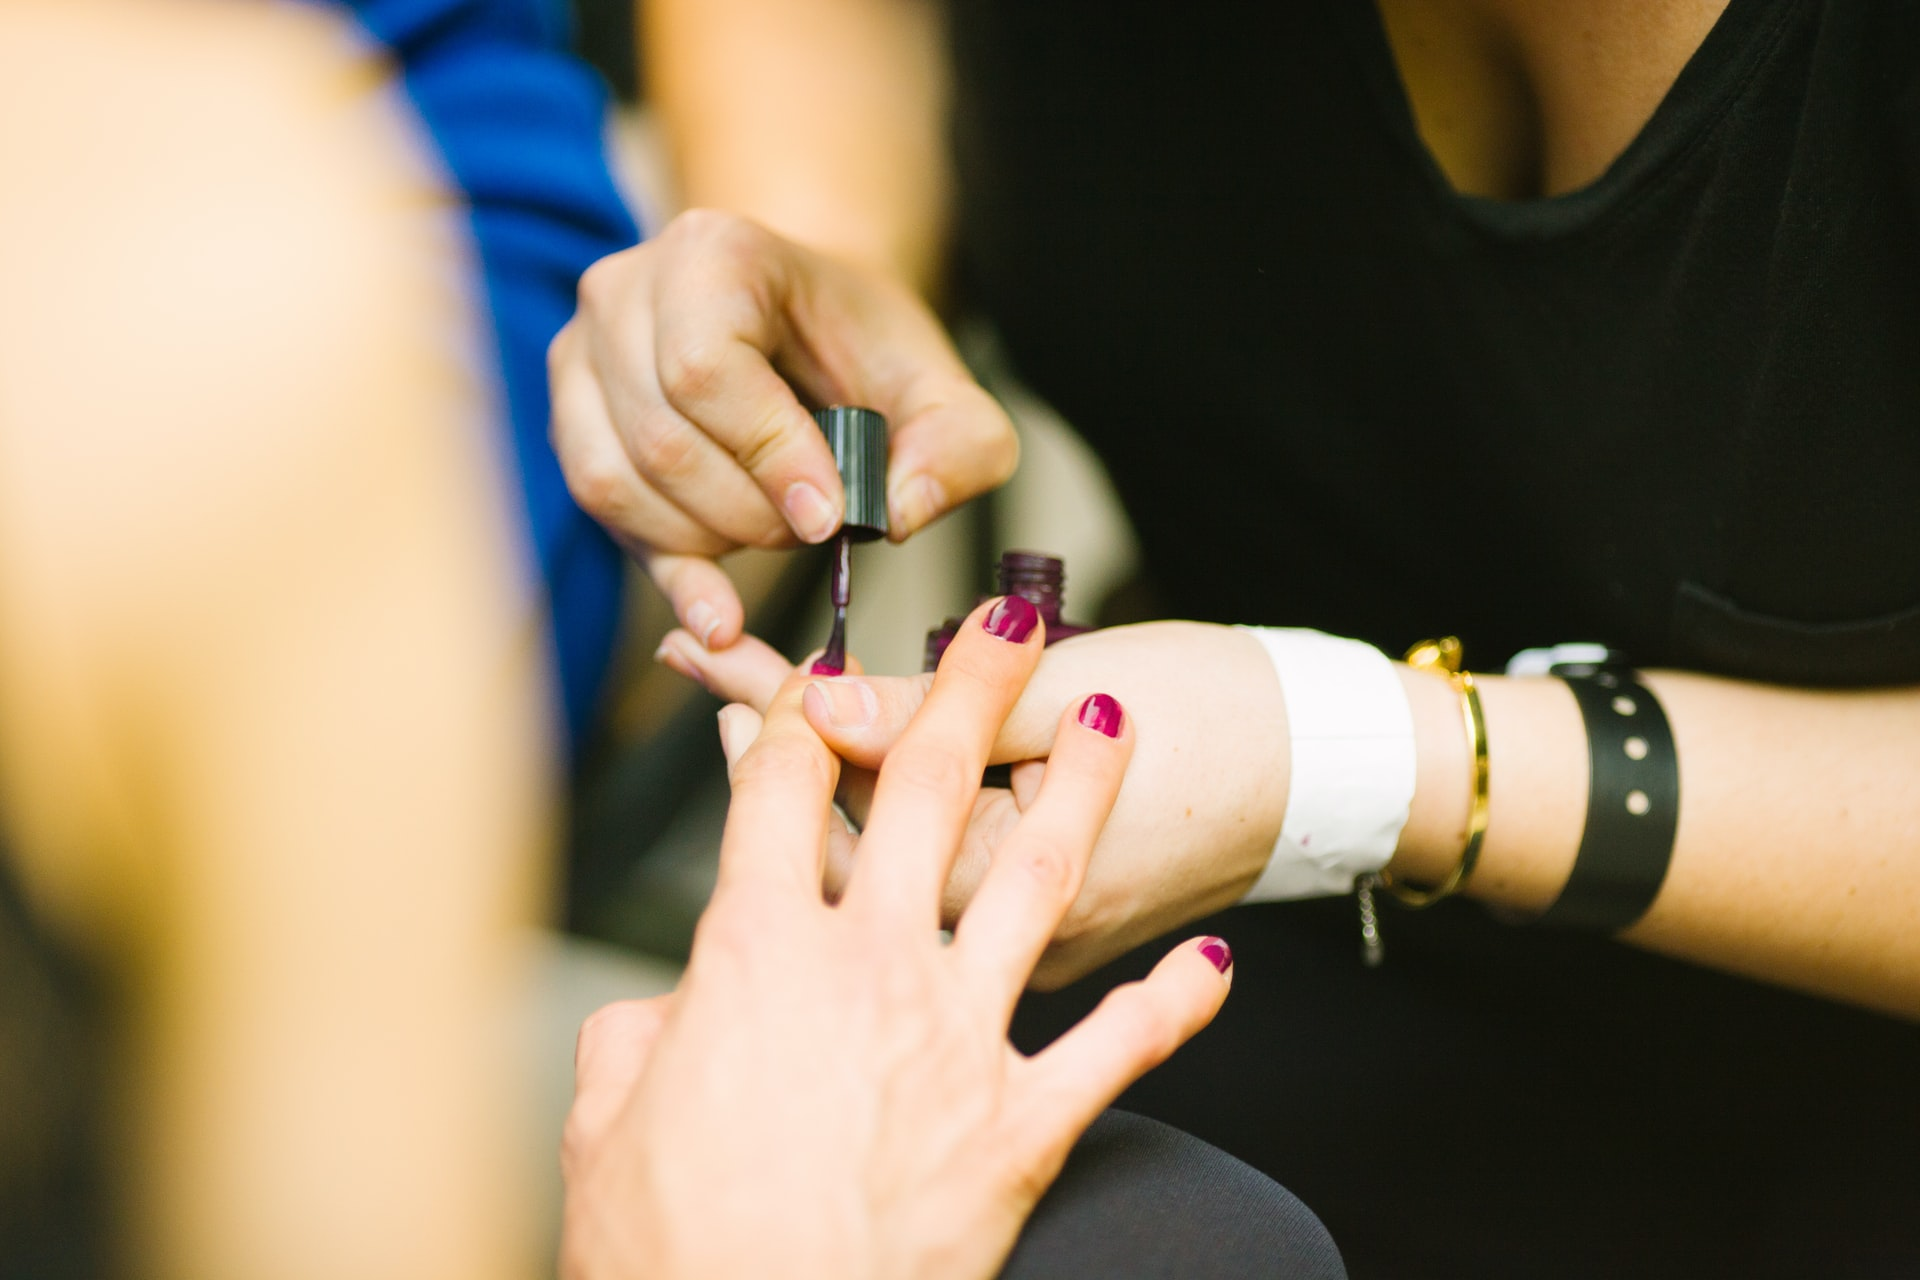 Como funciona o curso de manicure faby cardoso?